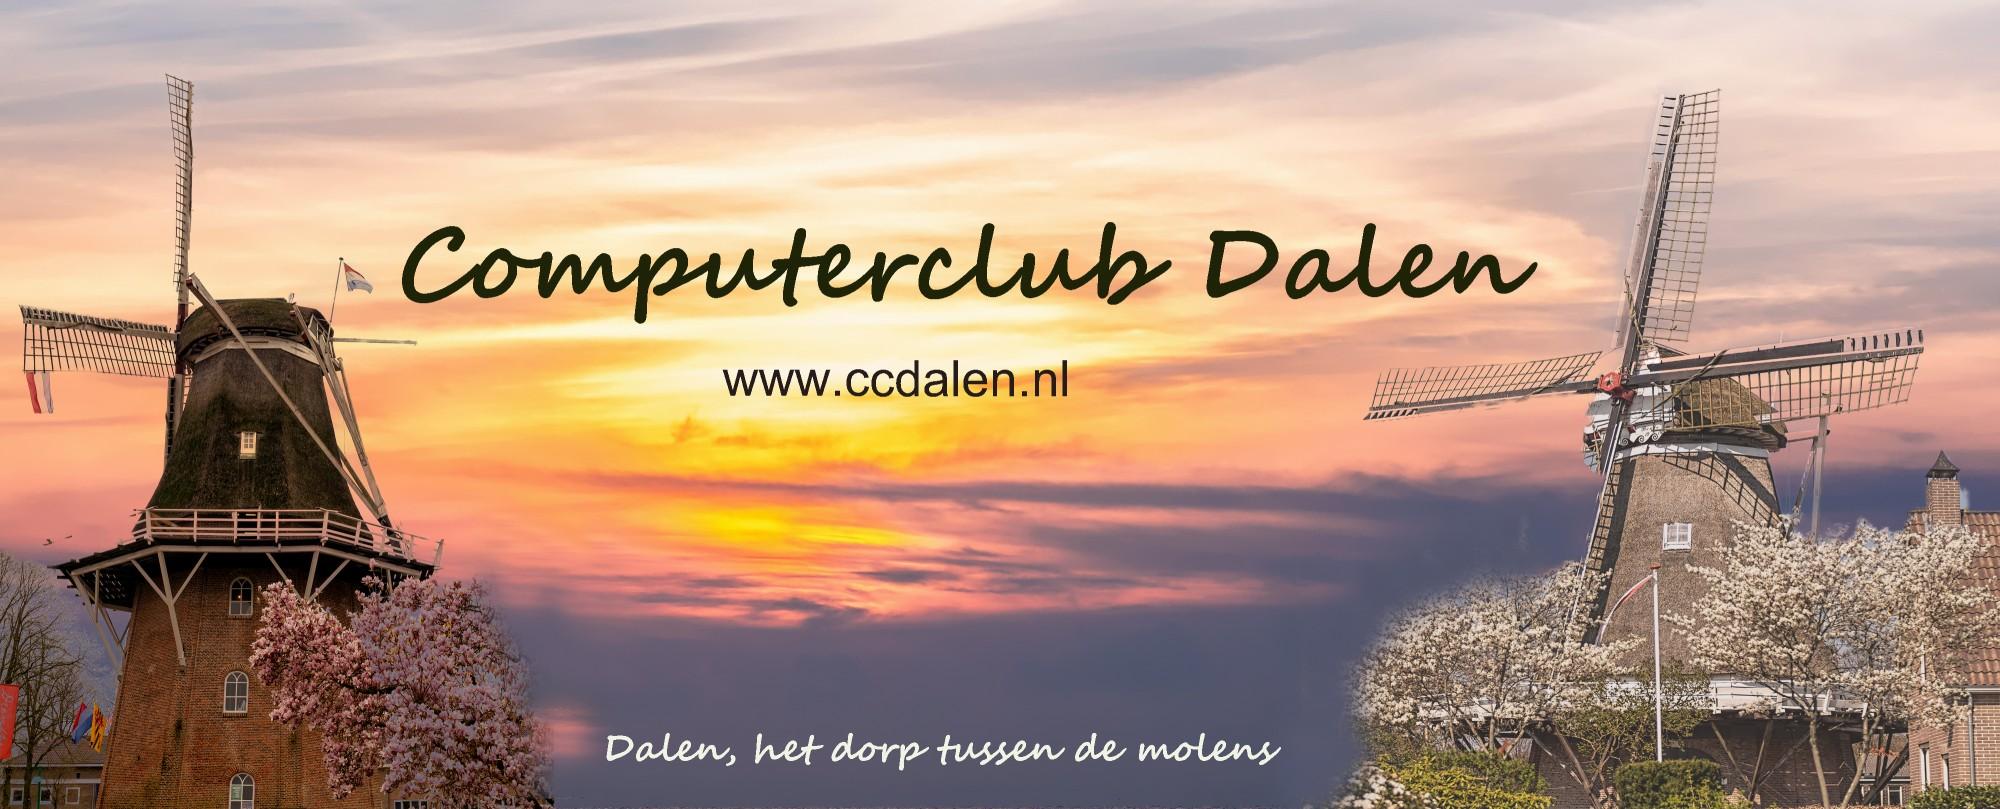 Foto Daler molens voor Computerclub Dalen